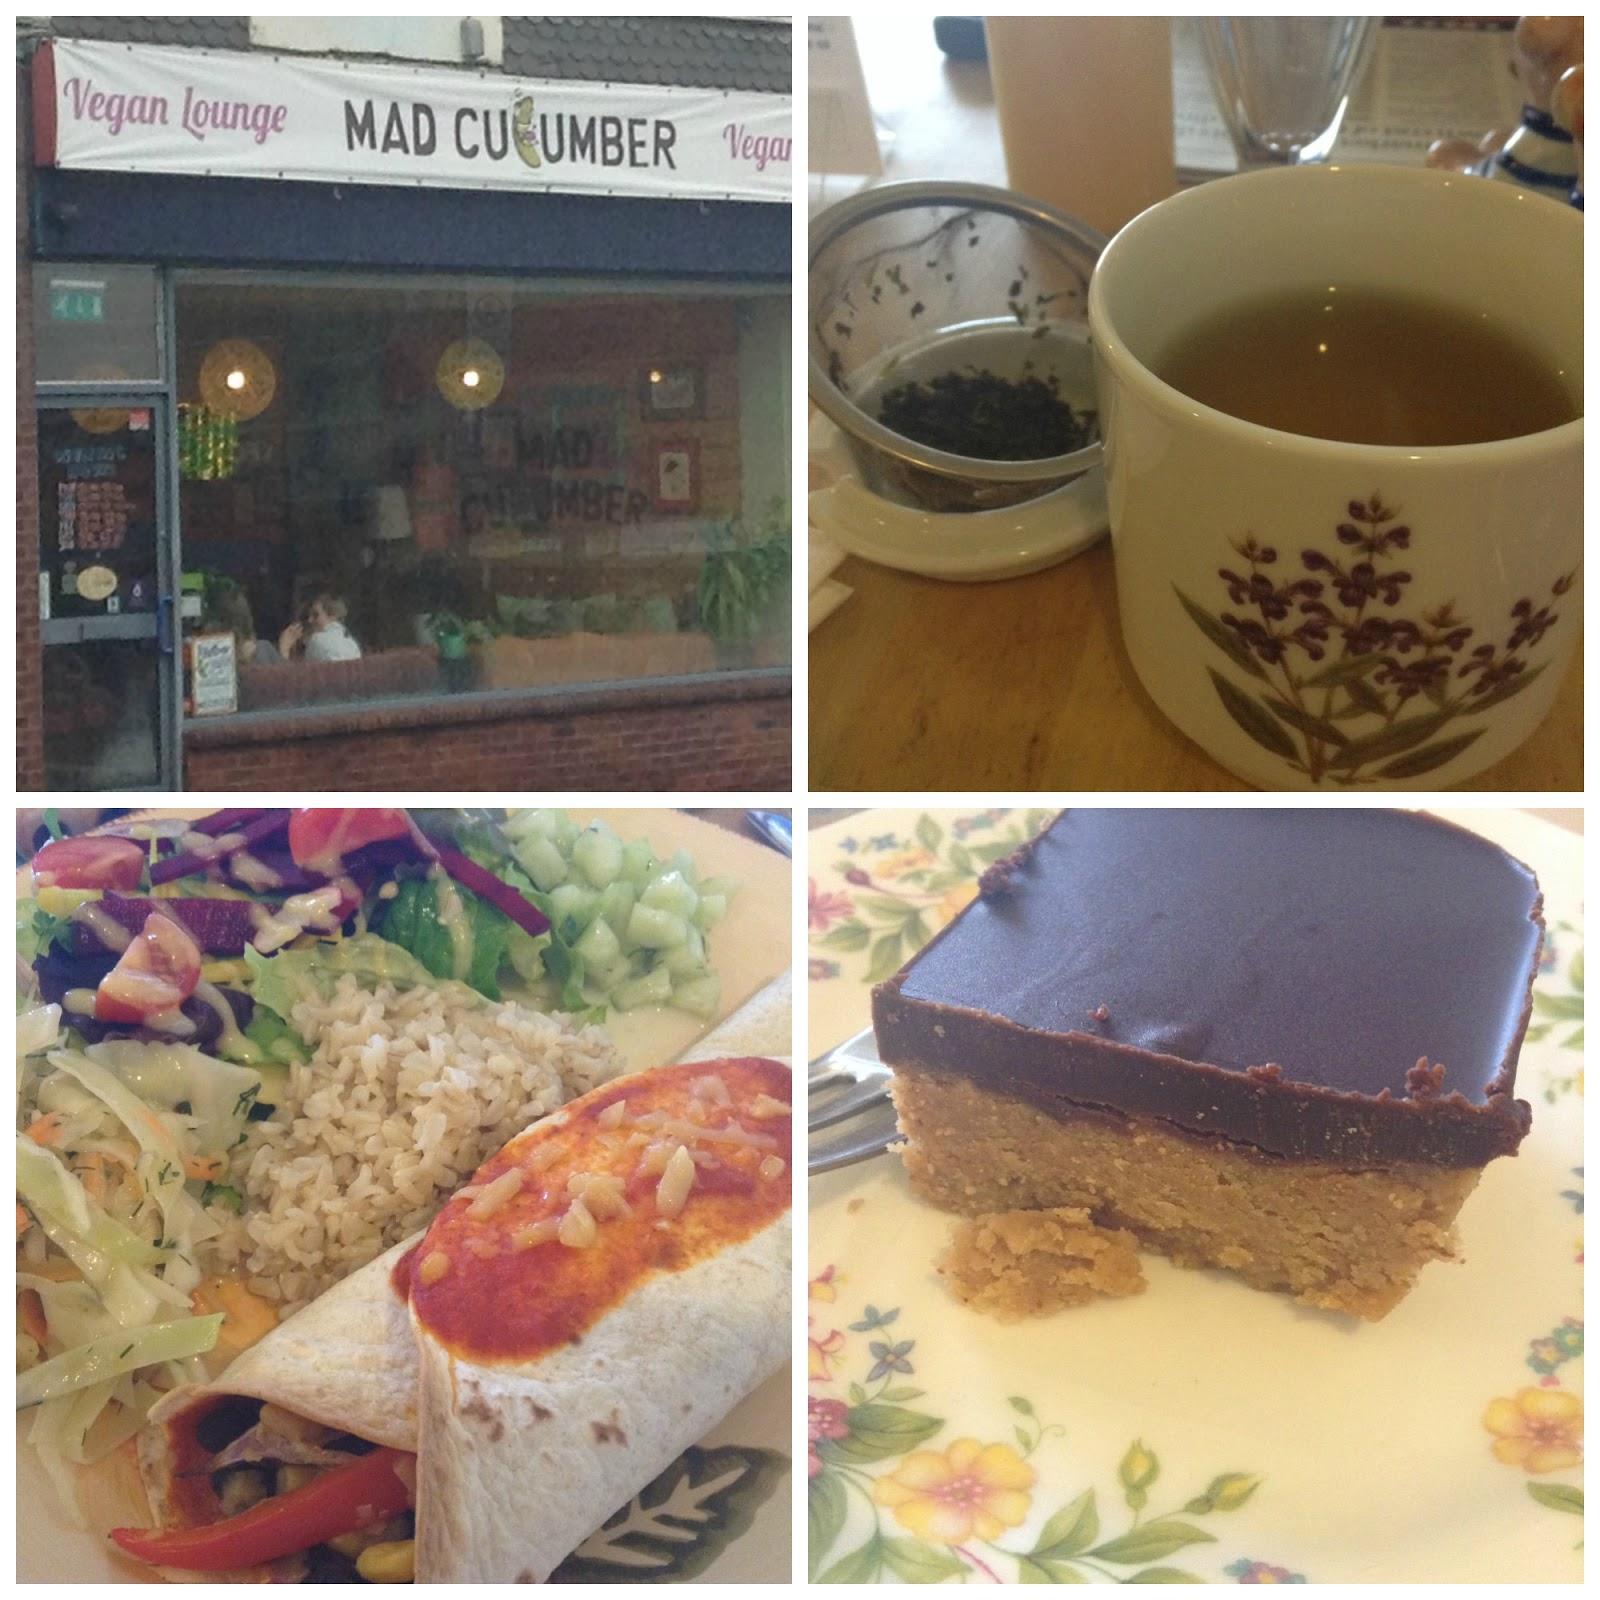 Mad Cucumber Vegan Lounge, Bournemouth